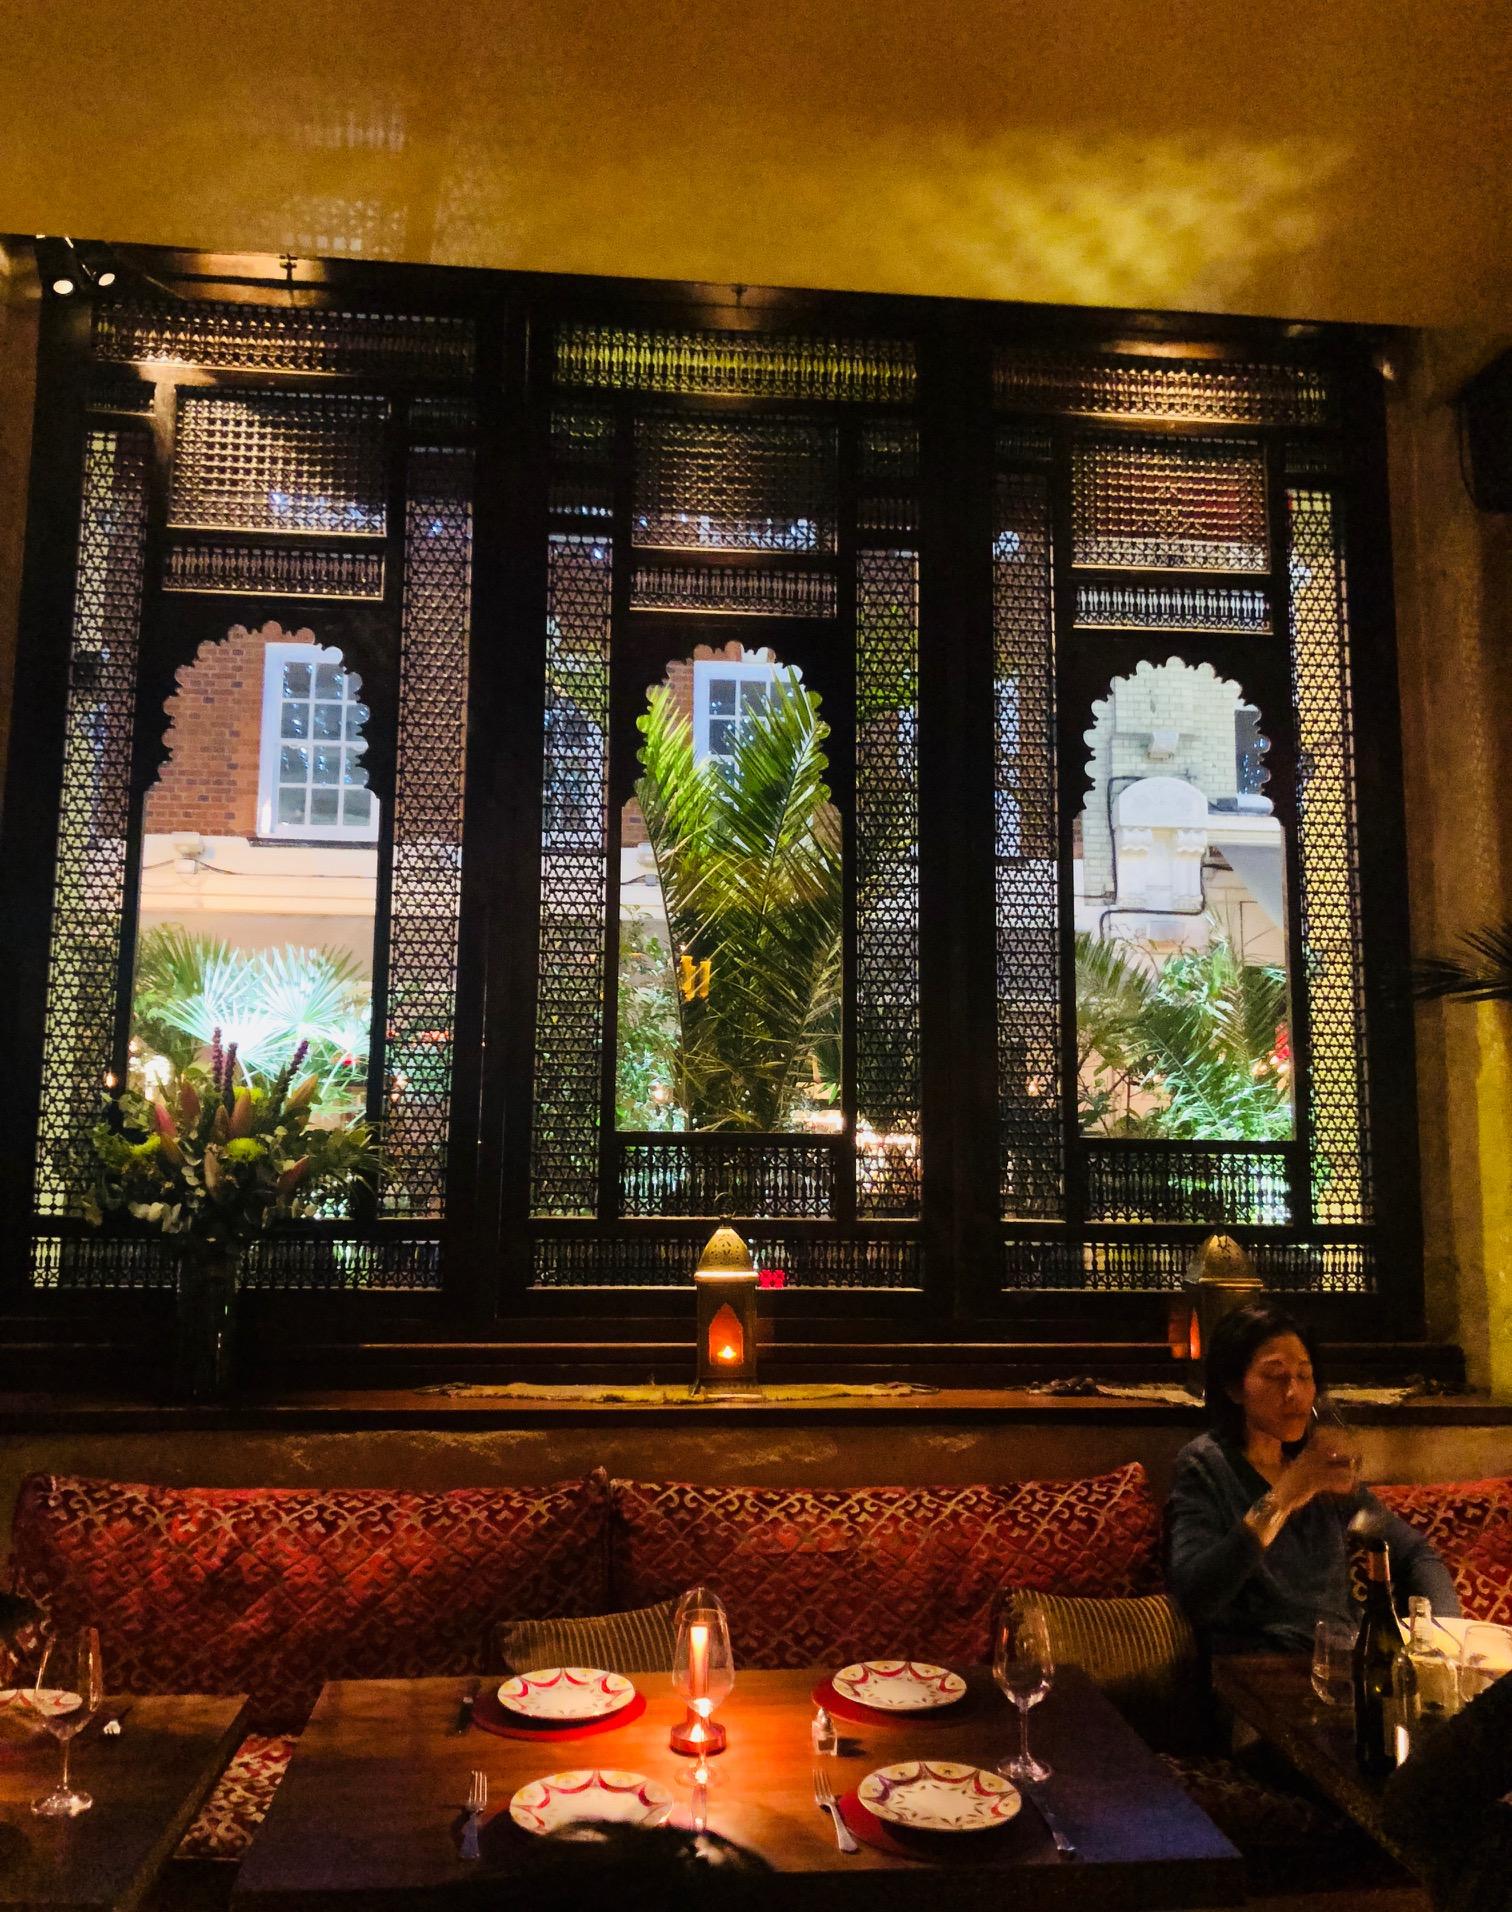 Beautiful Interiors of the Restaurant